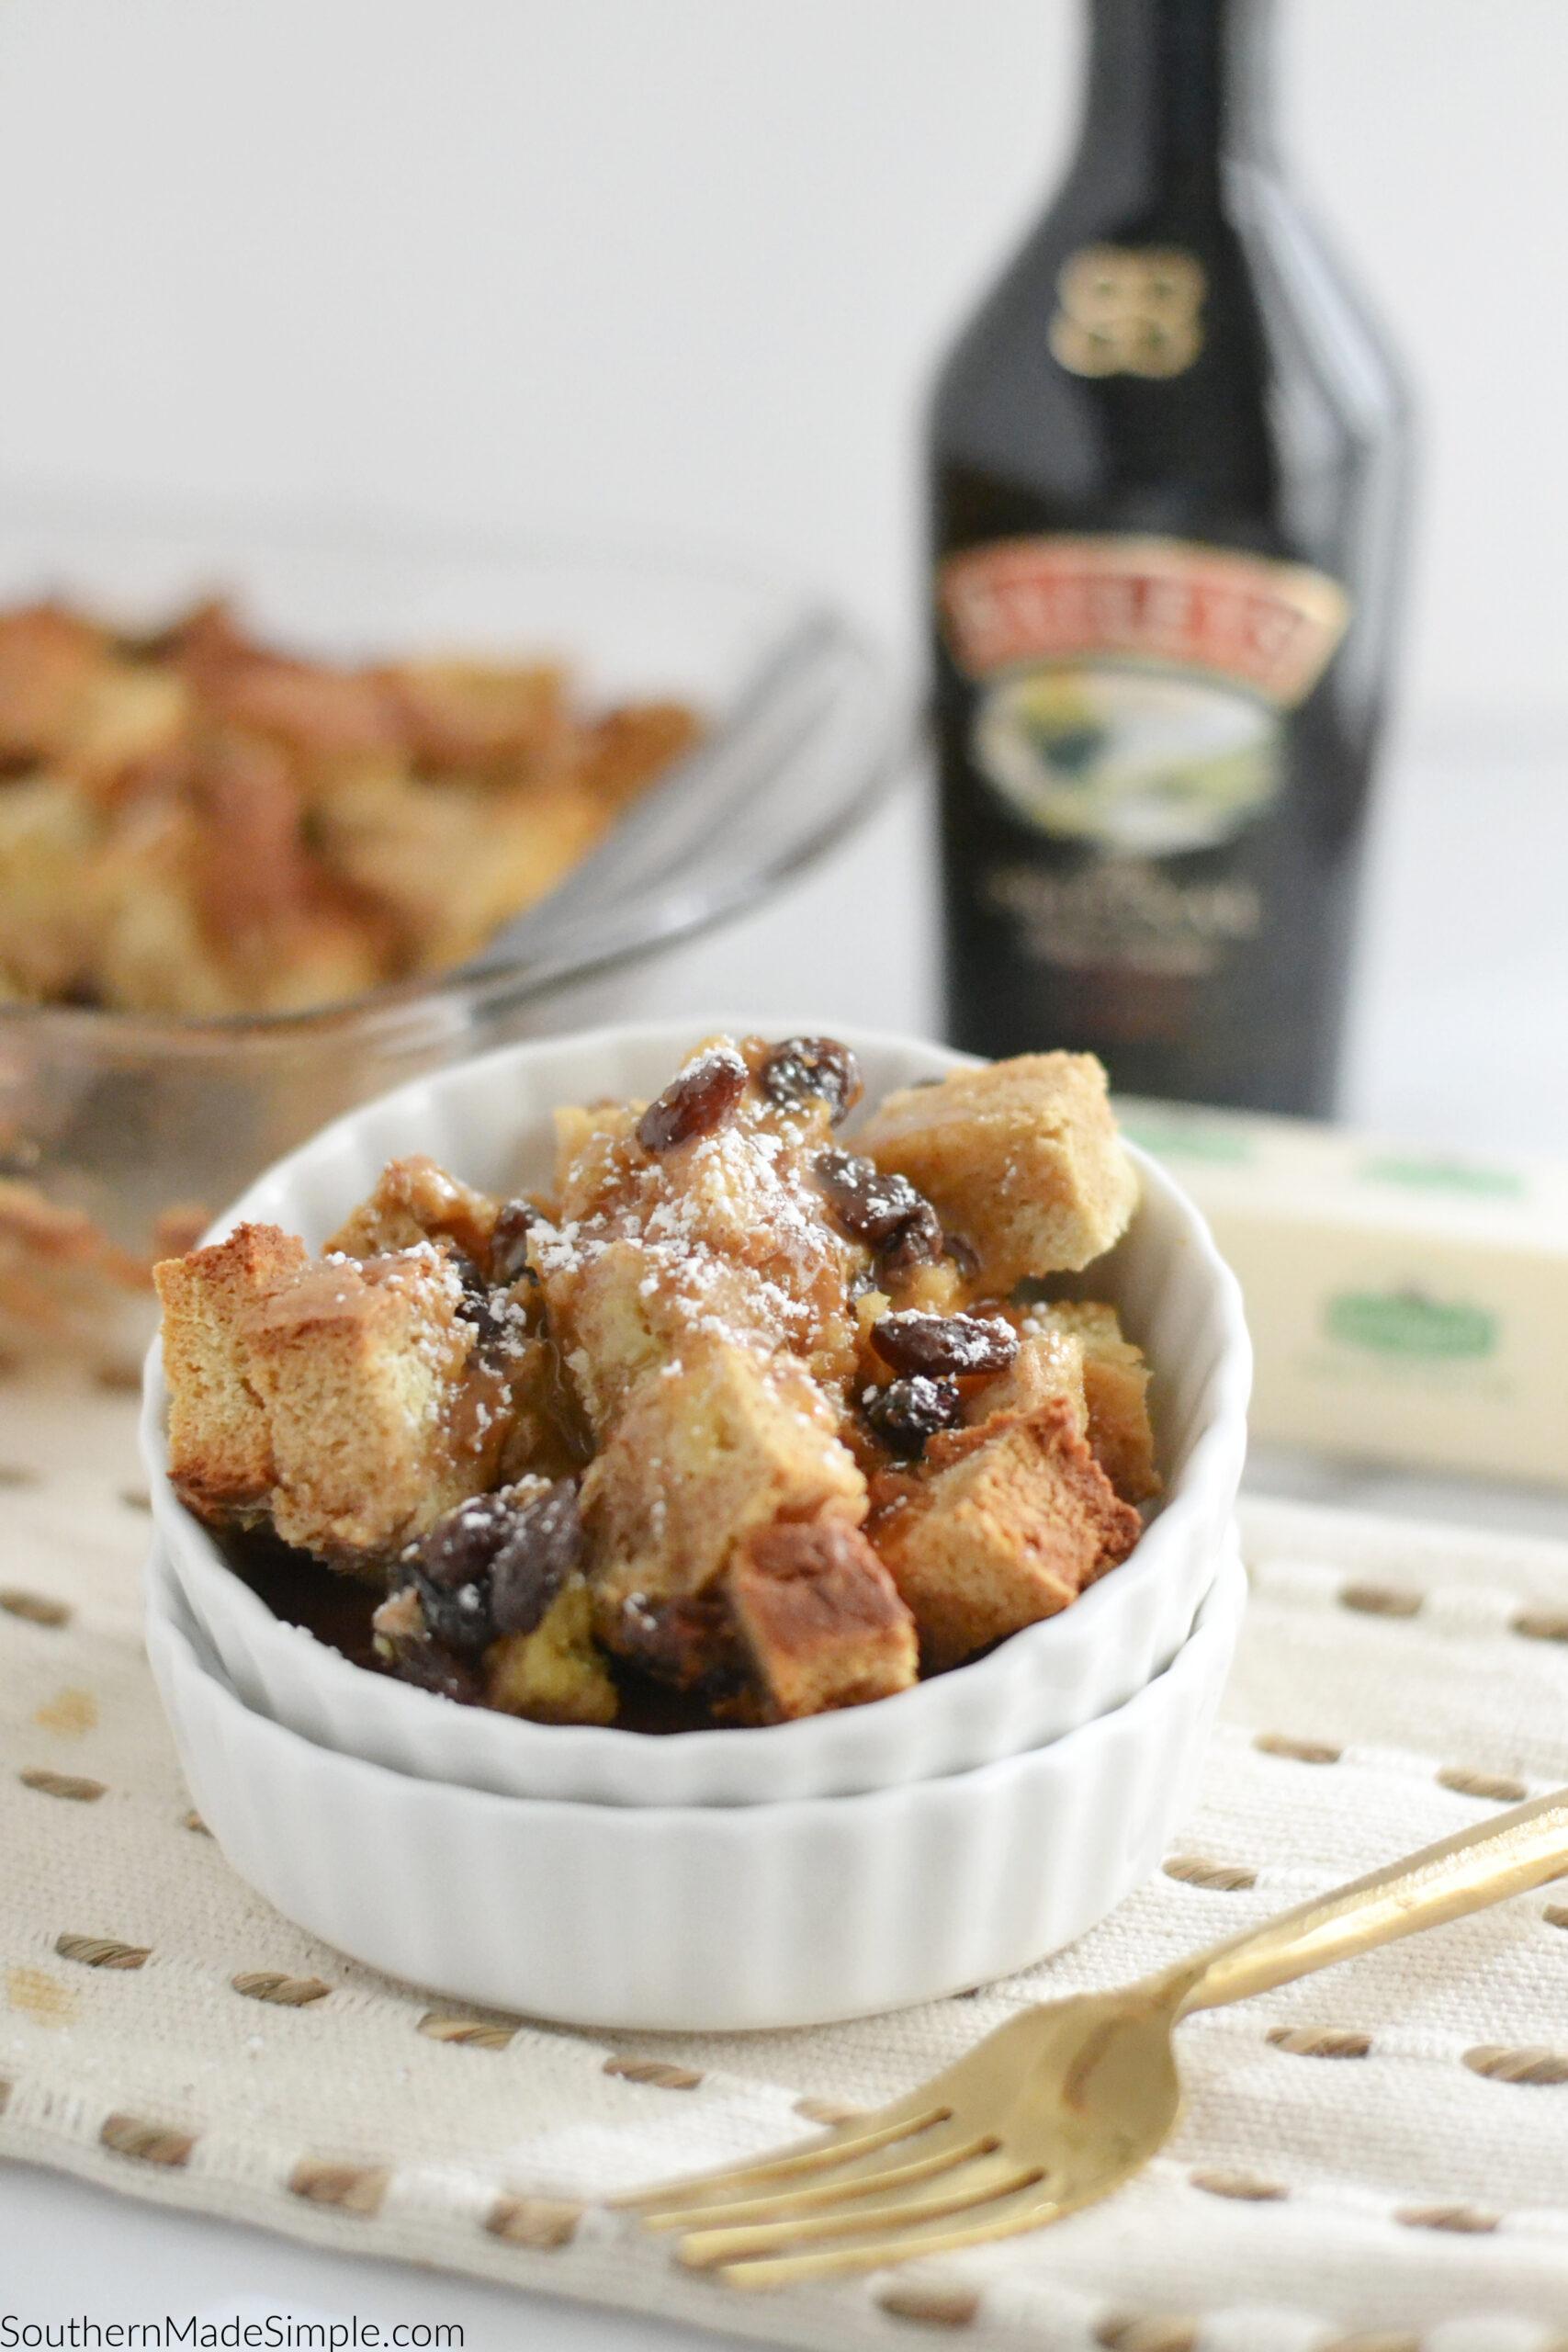 Irish Soda Bread Pudding with Bailey's Caramel Cream Sauce